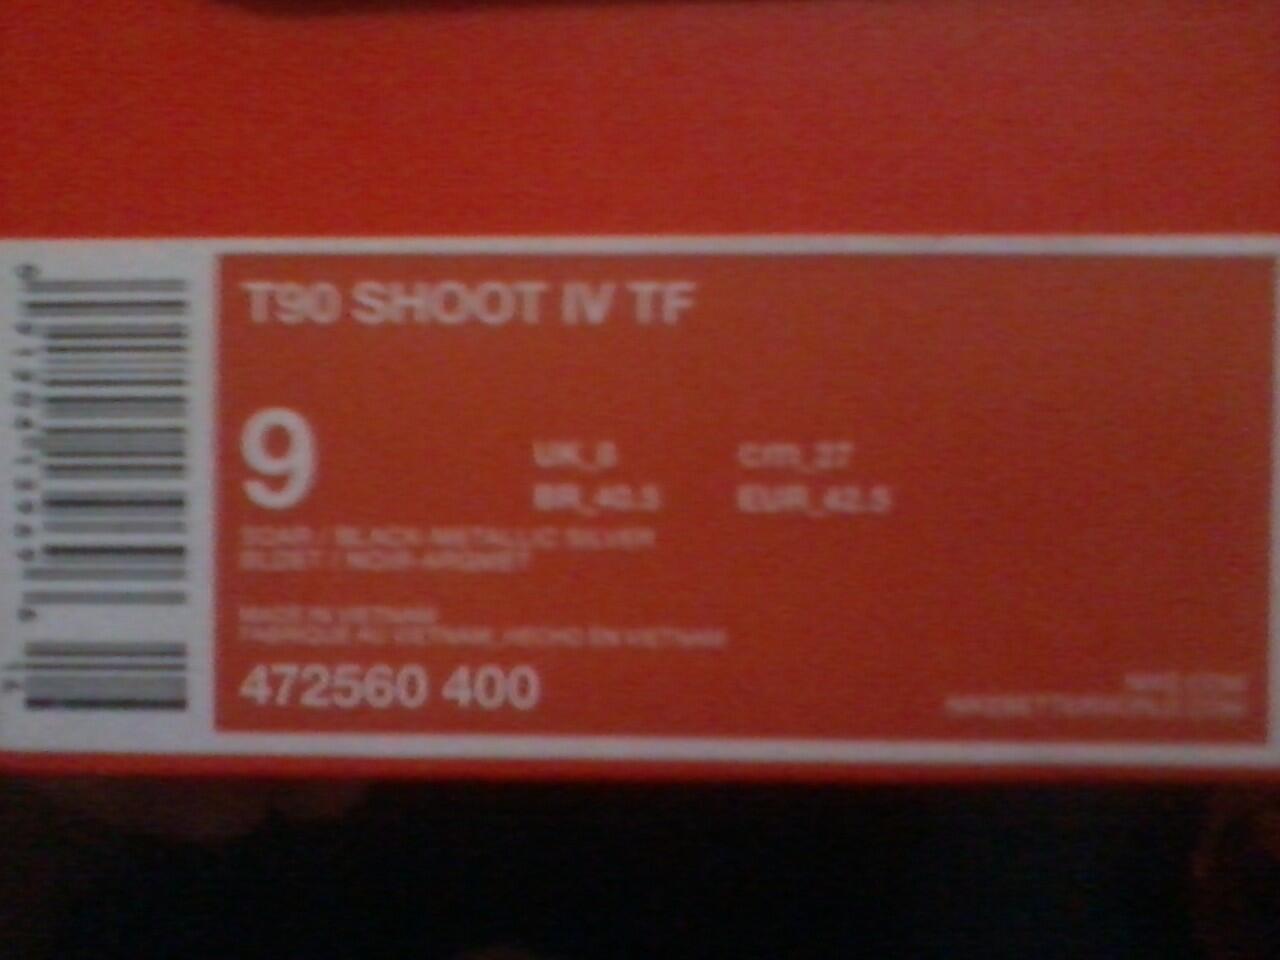 JualRugi SepatuFutsal T90 SHOOT IV TF (NEGO TIPIS)